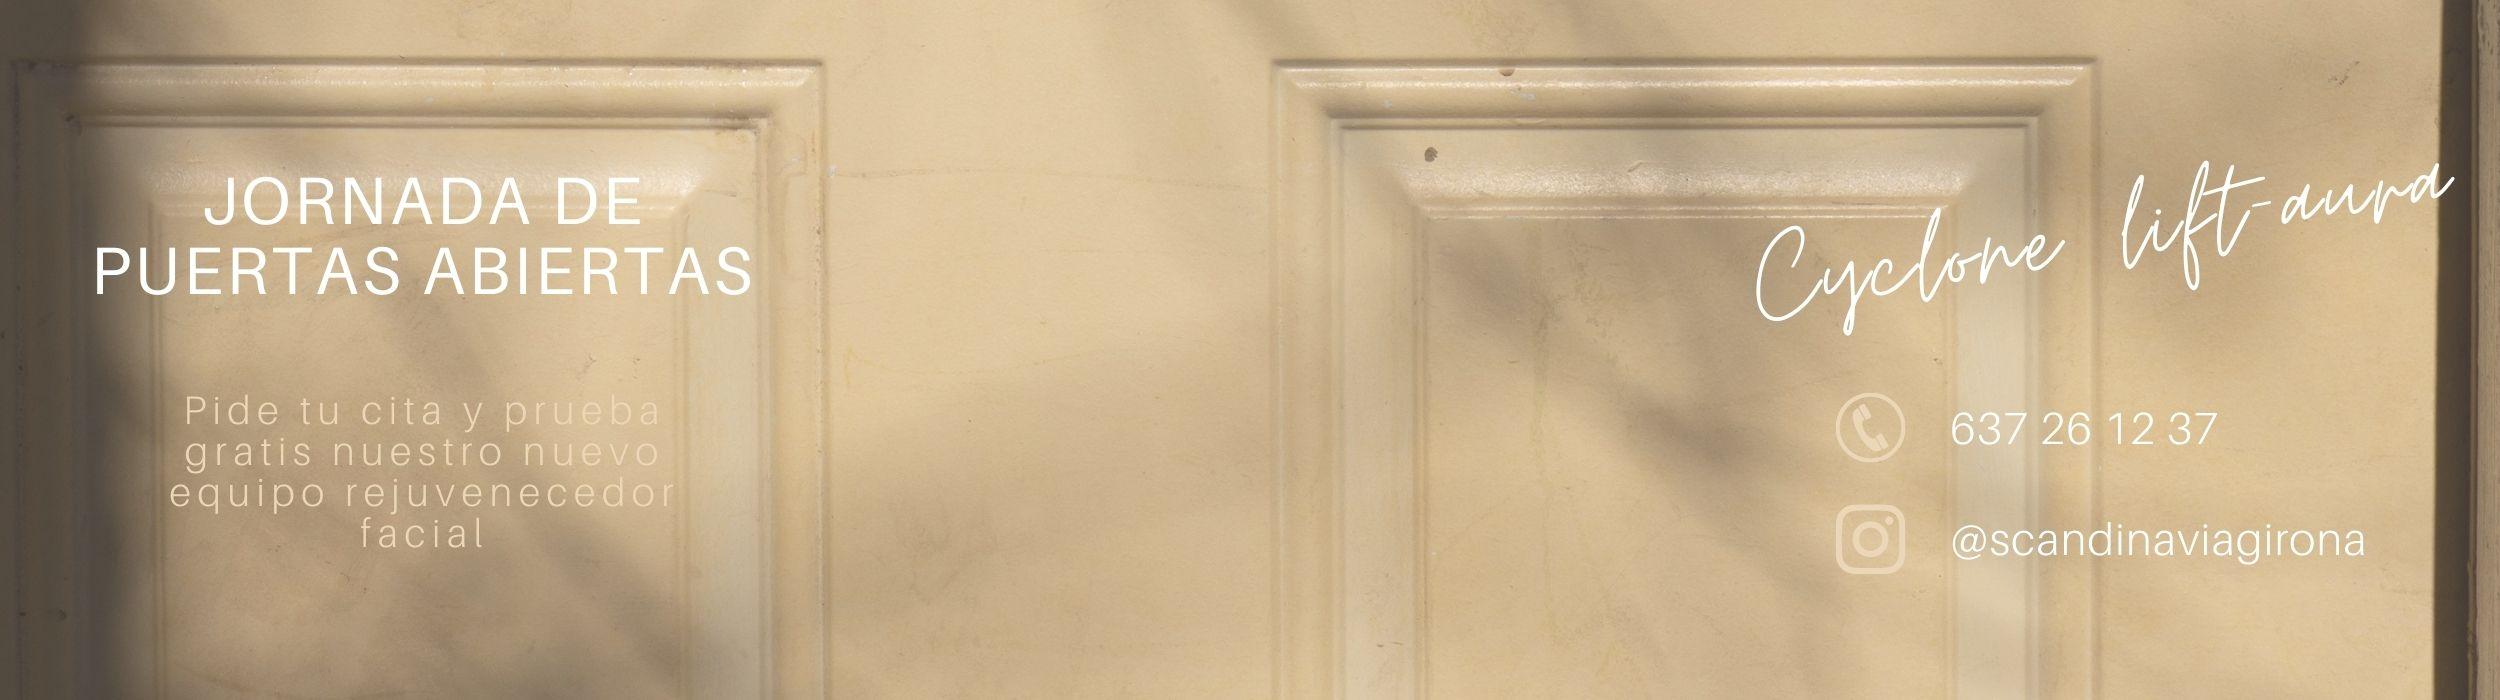 slider scandinavia girona puertas abiertas cyclone aura facial